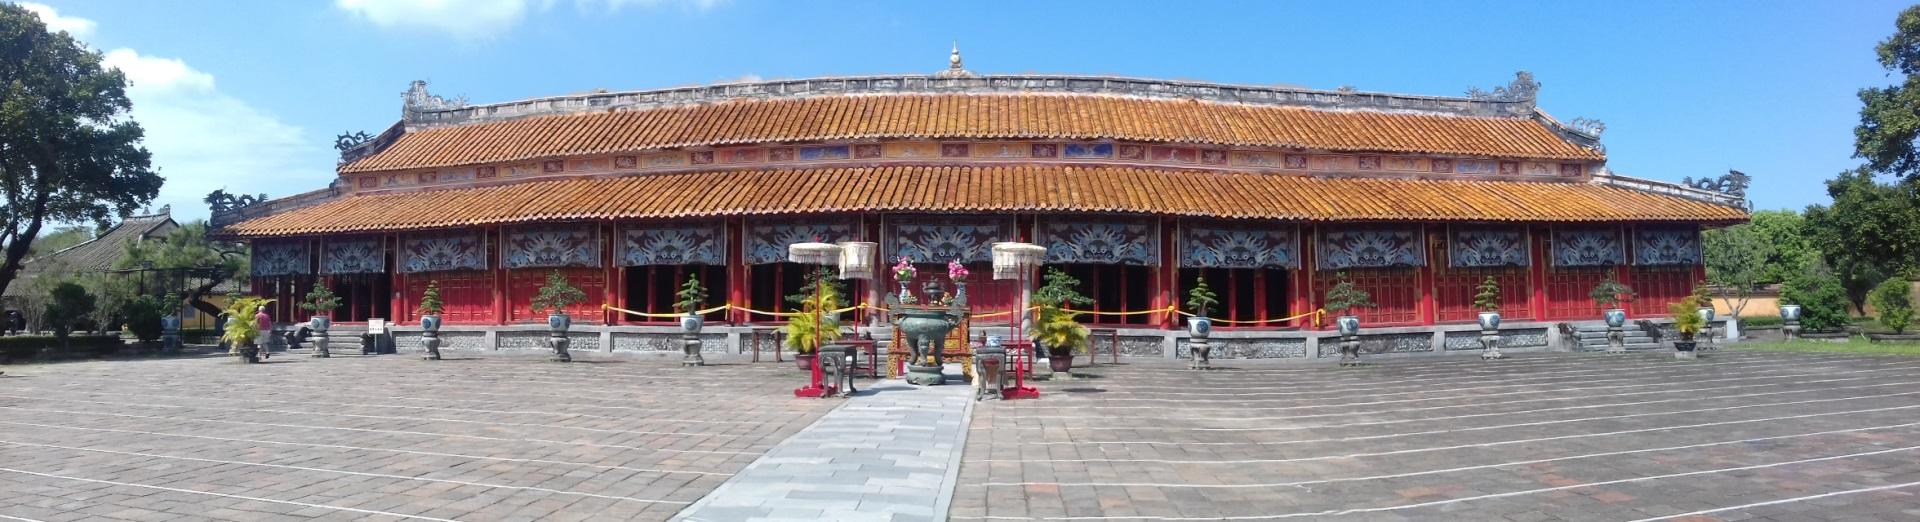 Visiter Hue - Vietnam